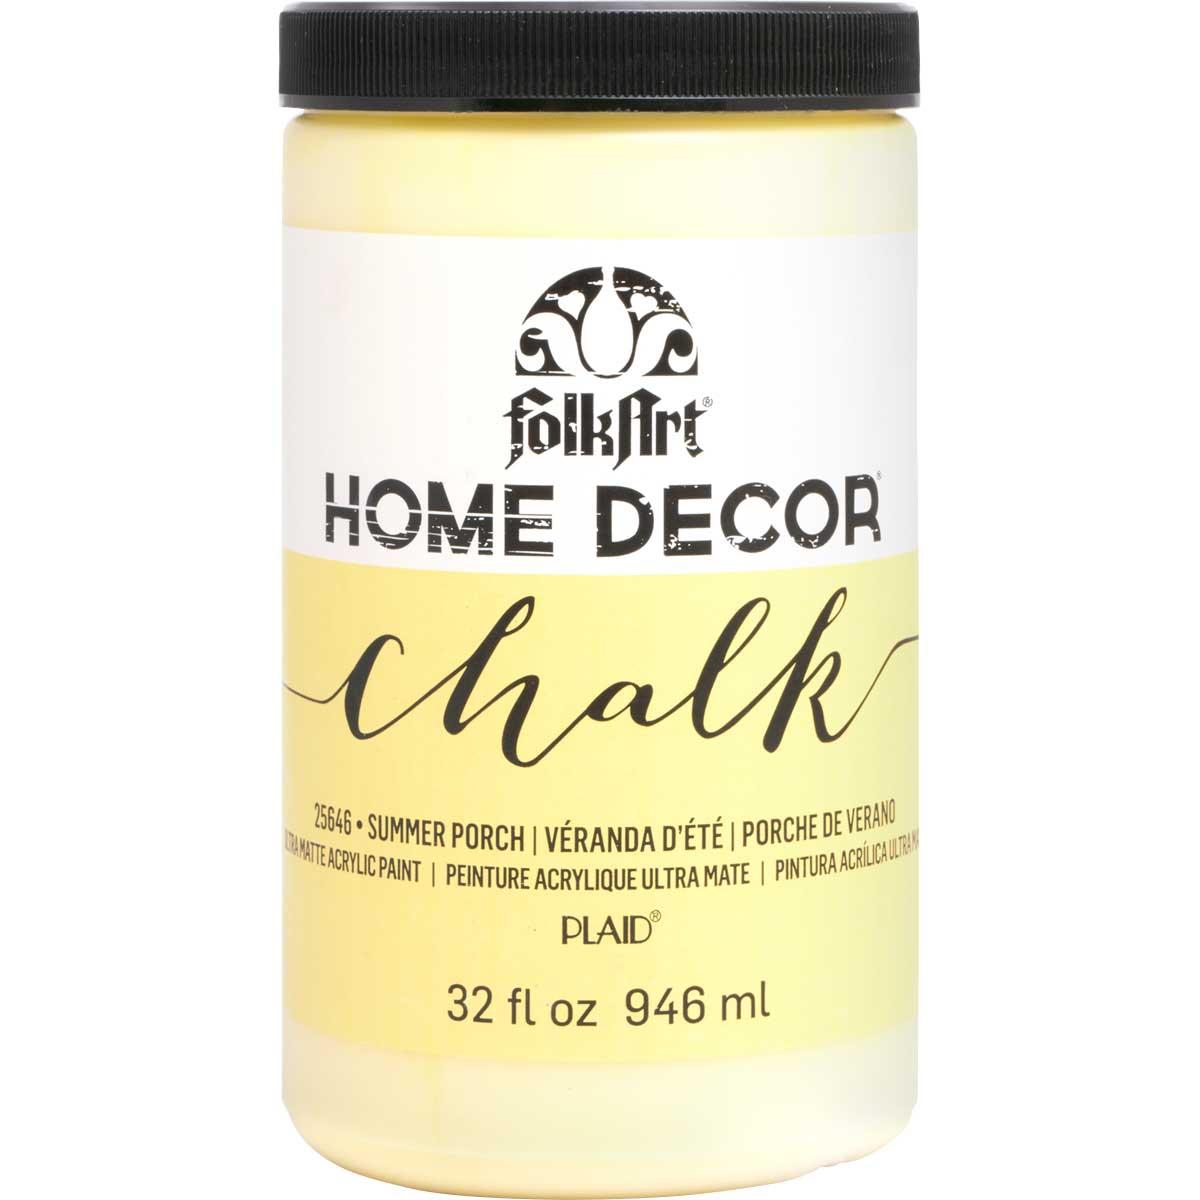 FolkArt ® Home Decor™ Chalk - Summer Porch, 32 oz.